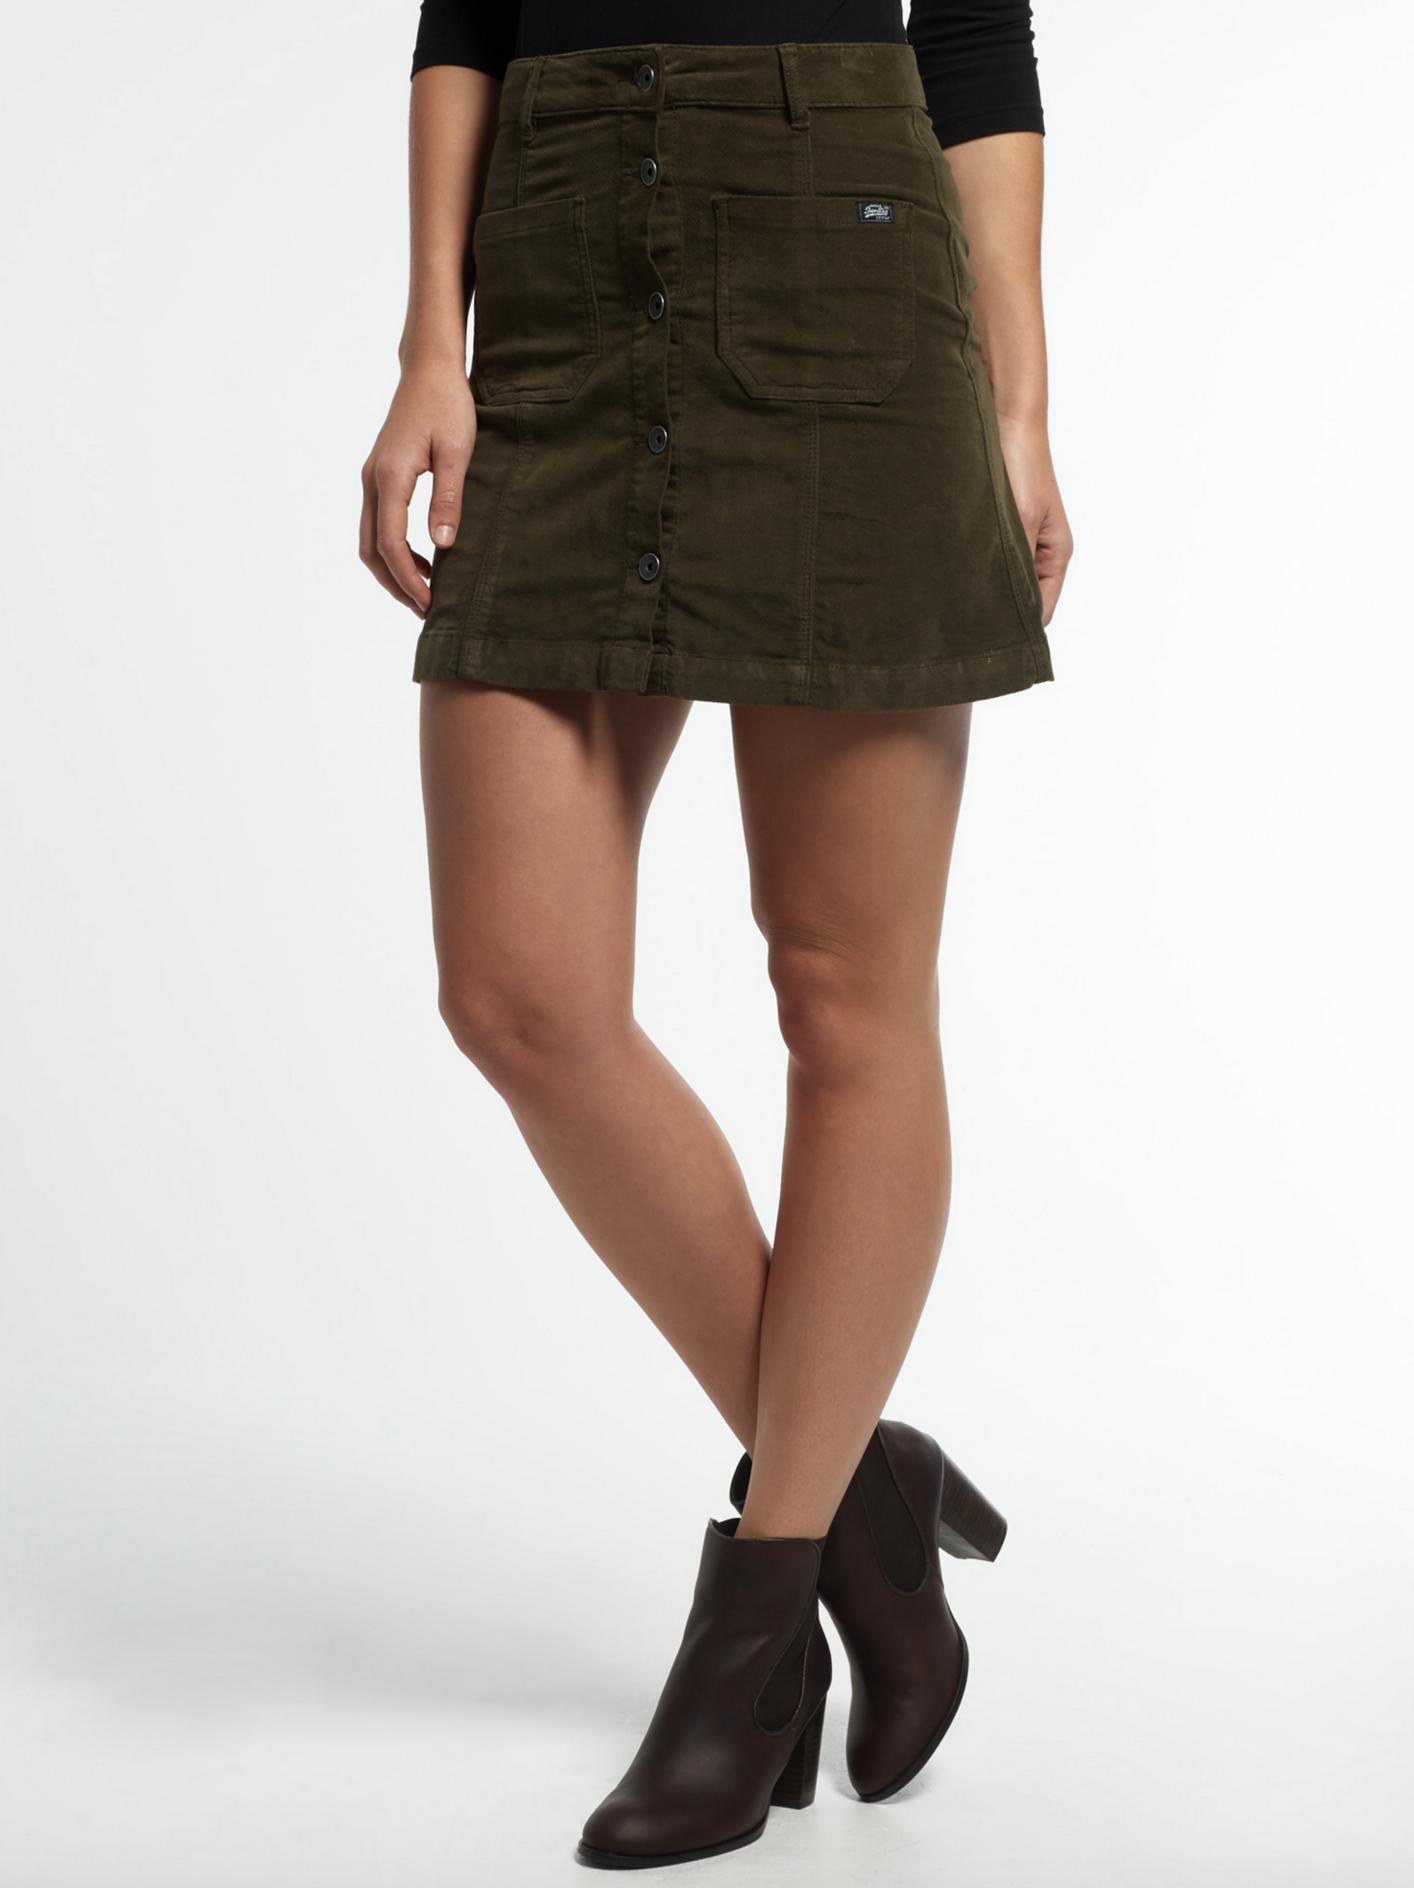 Superdry A-line skirt $74.99